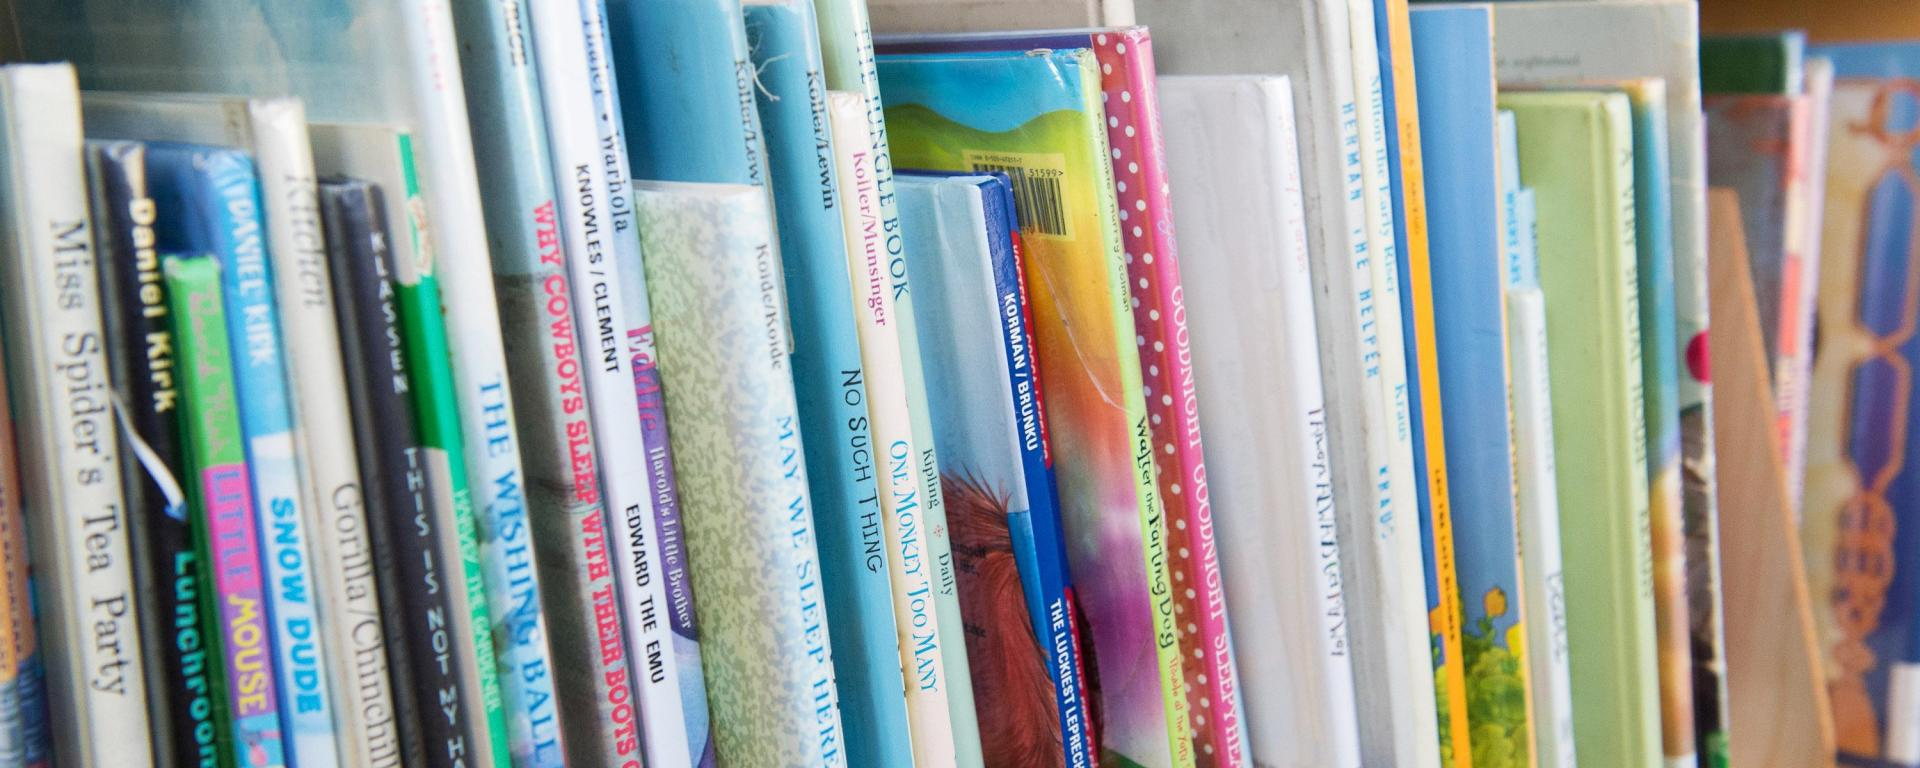 image of kids books on the shelf